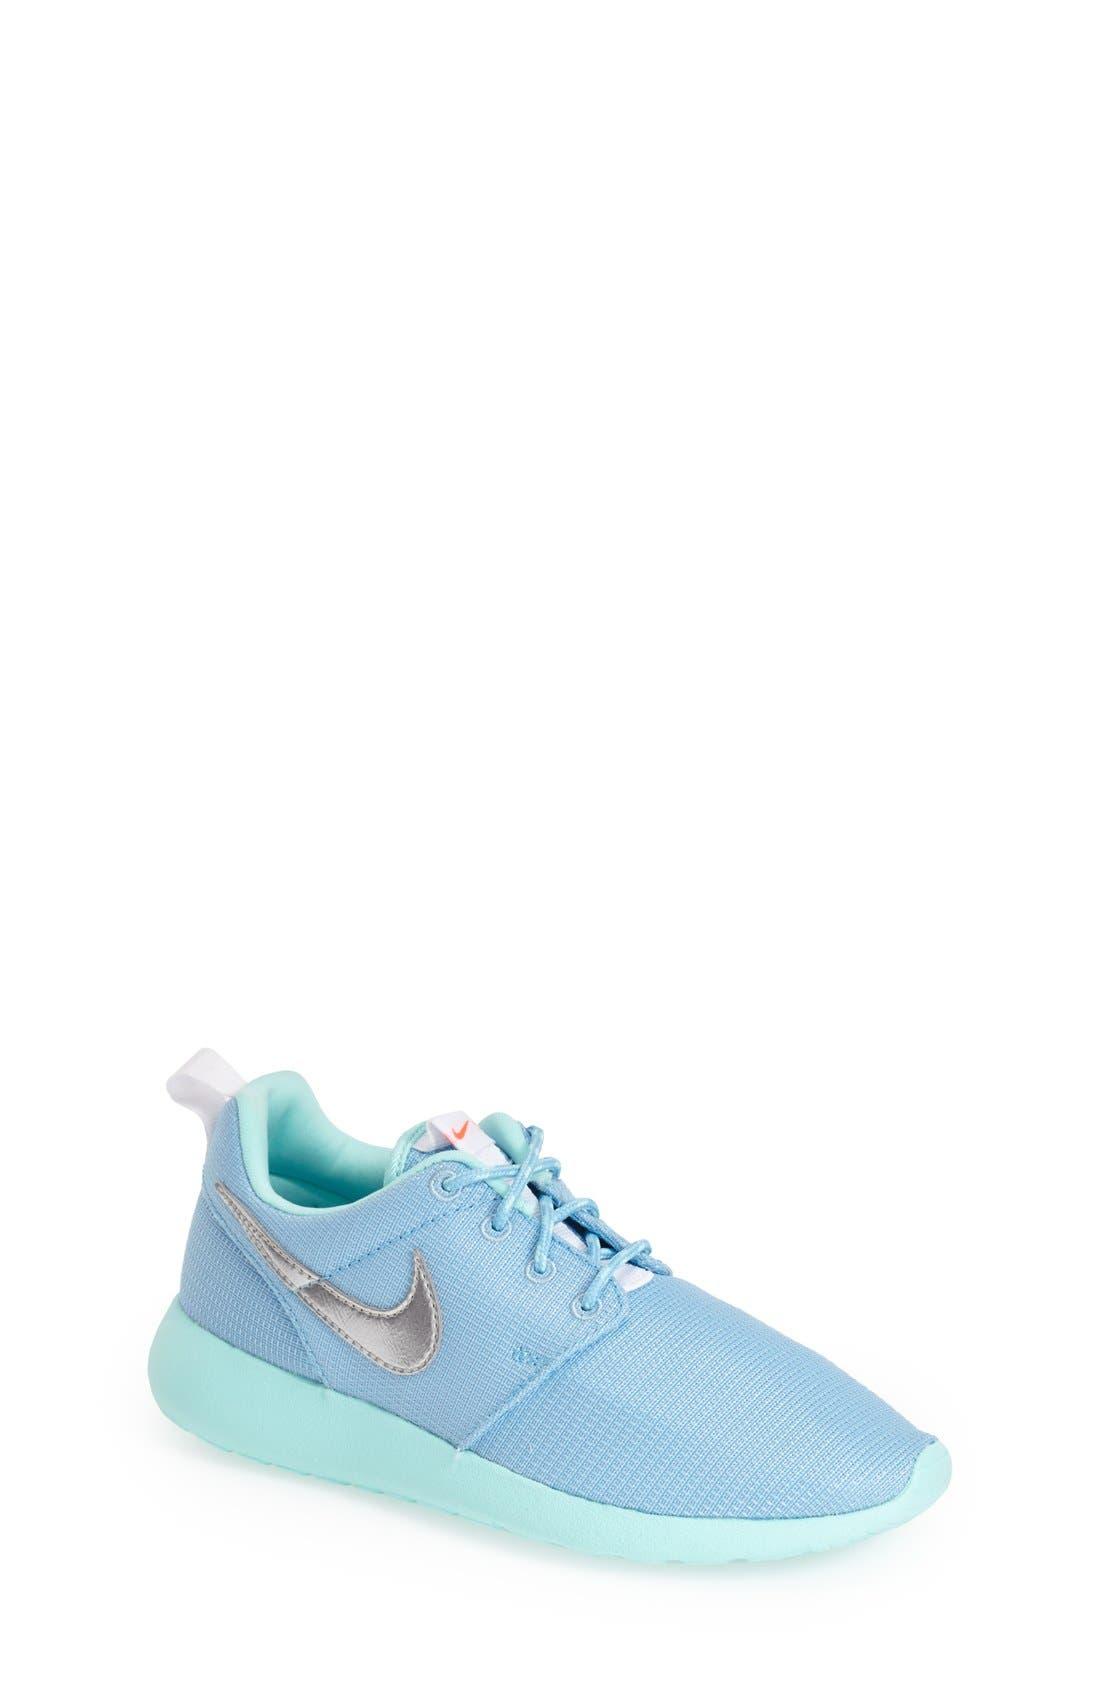 'Roshe Run' Athletic Shoe,                             Main thumbnail 33, color,